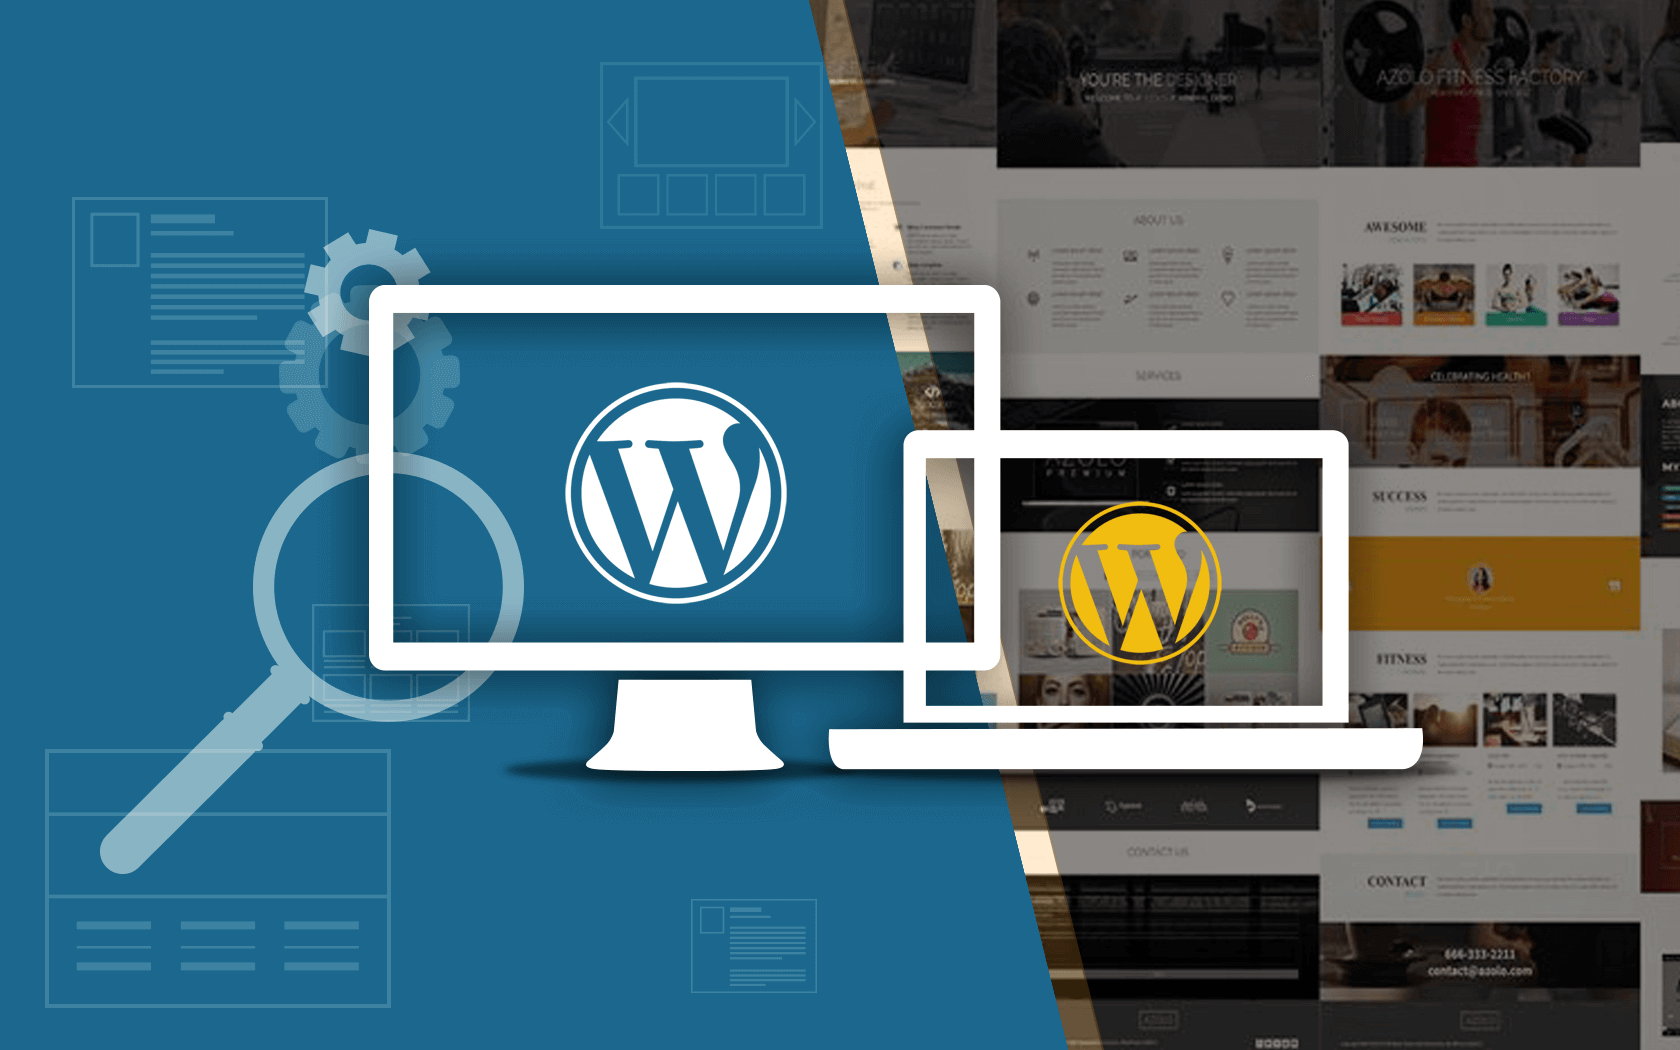 wordpress-web-development-trends-of-2019